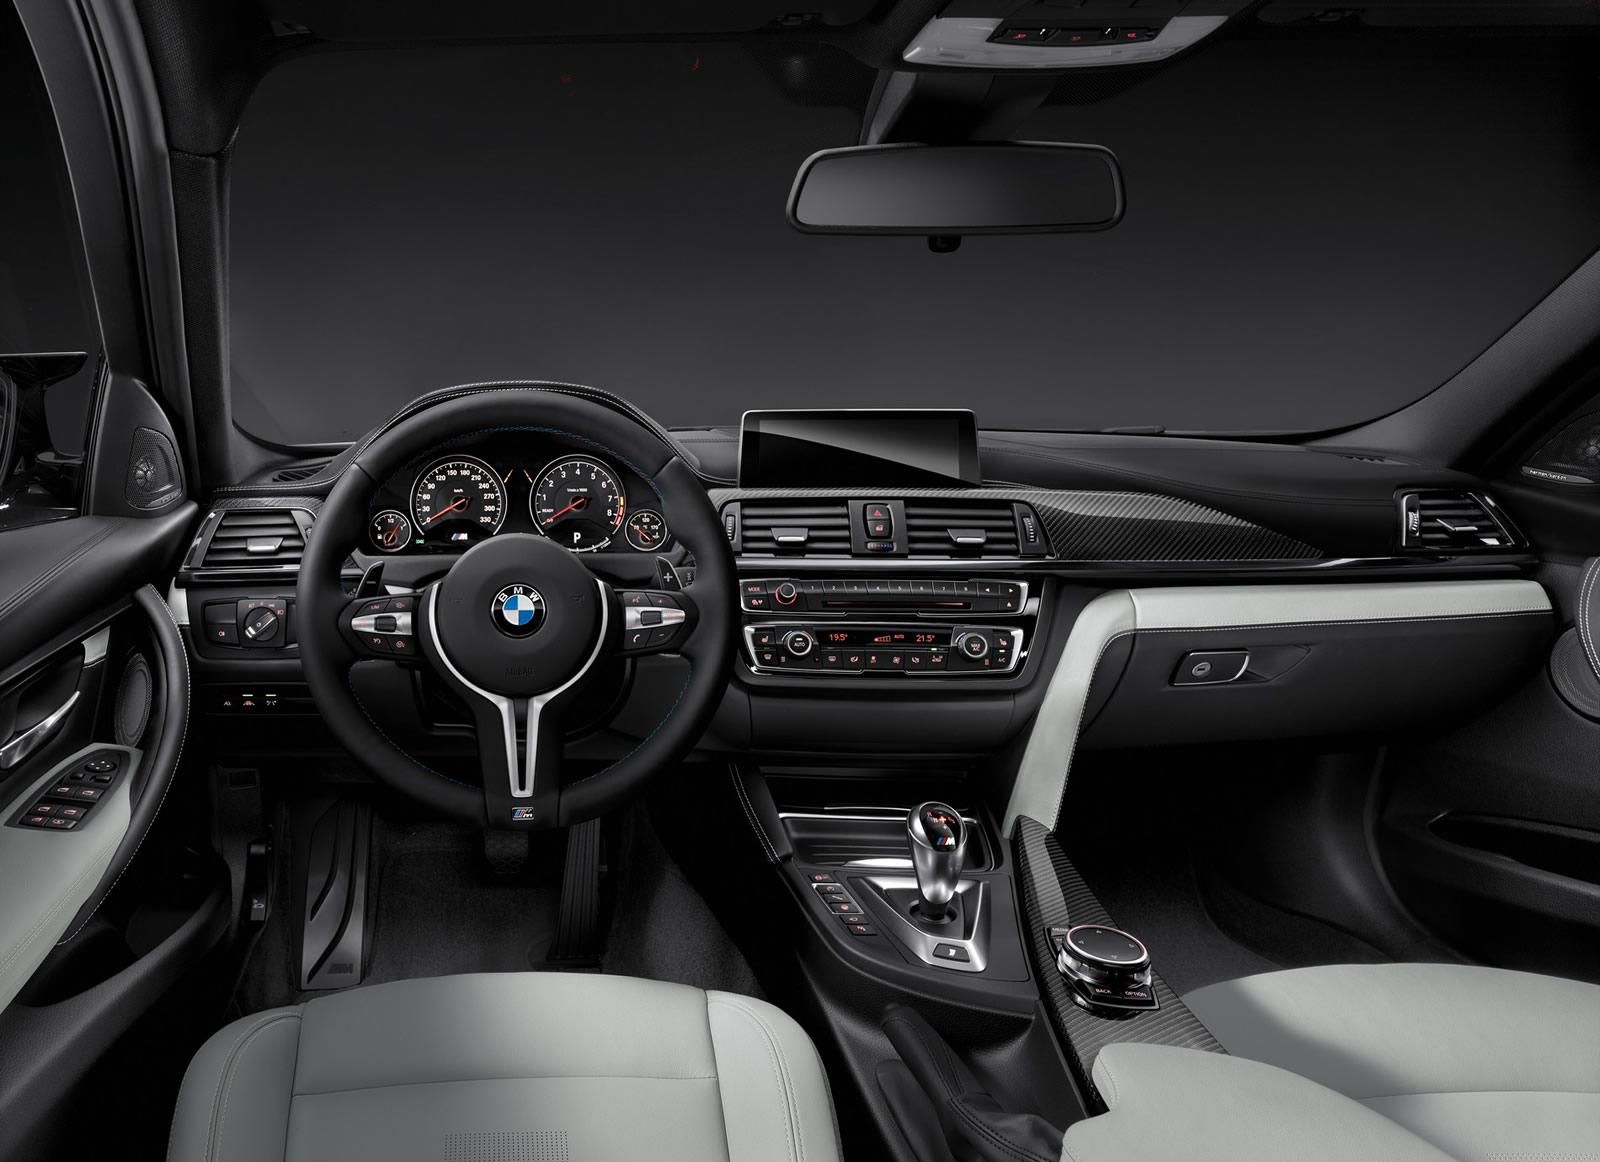 Foto de BMW M3 2014 (13/13)